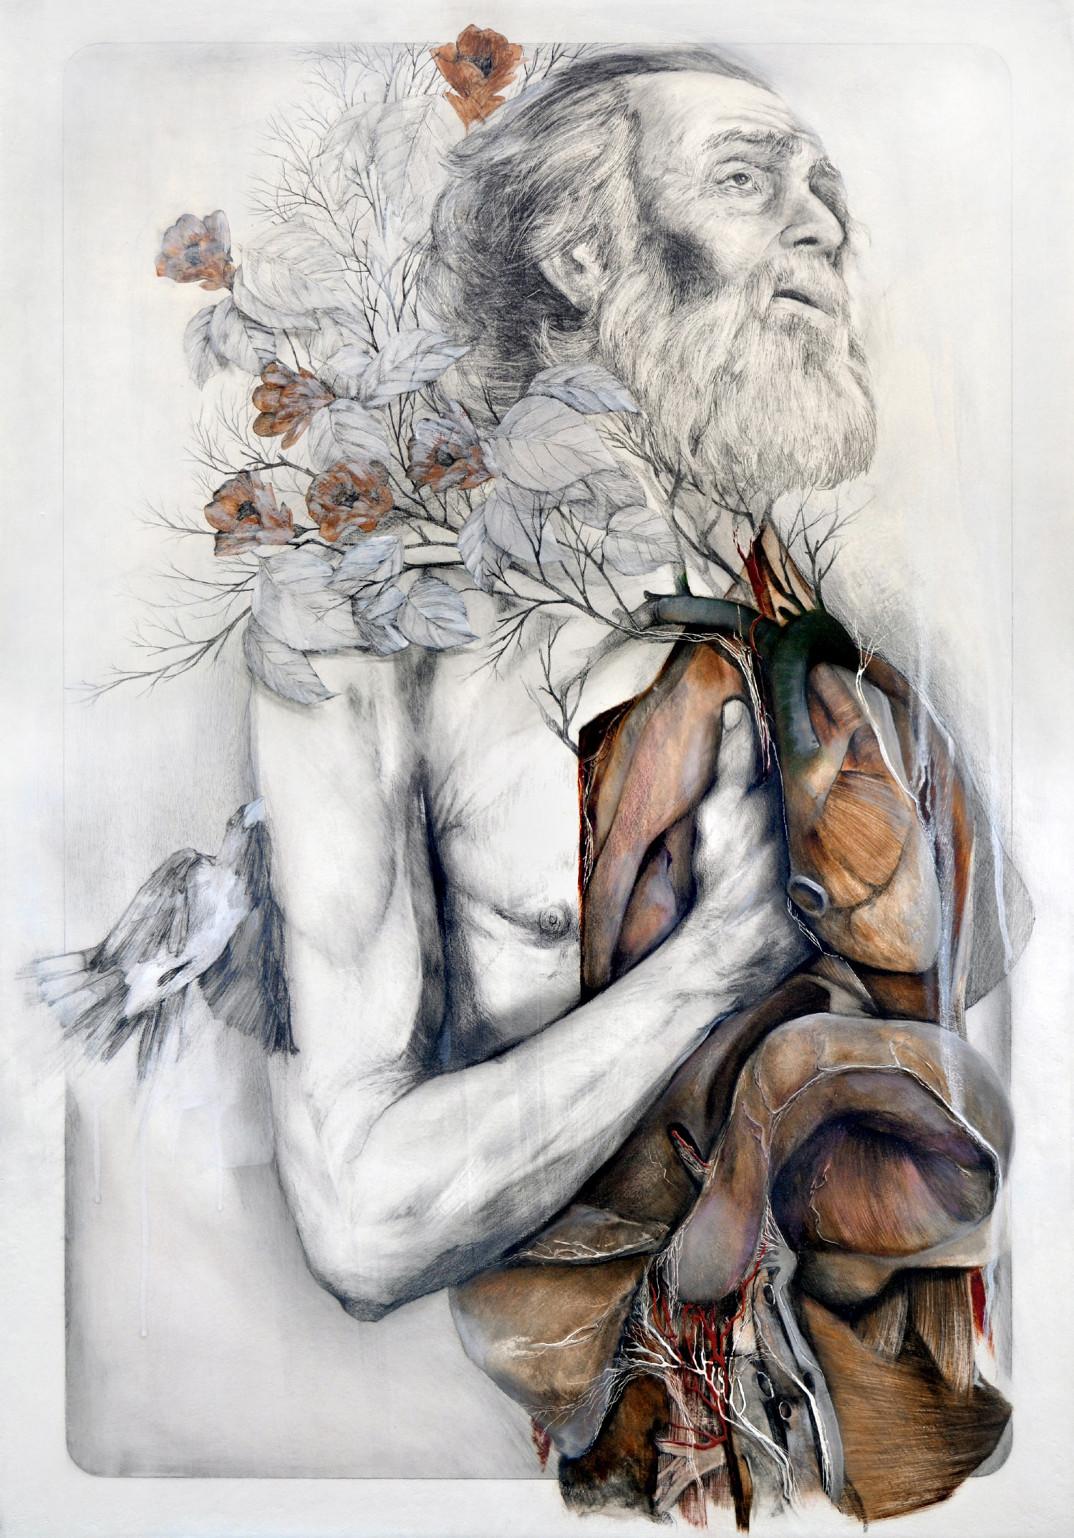 dipinti-corpi-anatomia-nunzio-paci-4